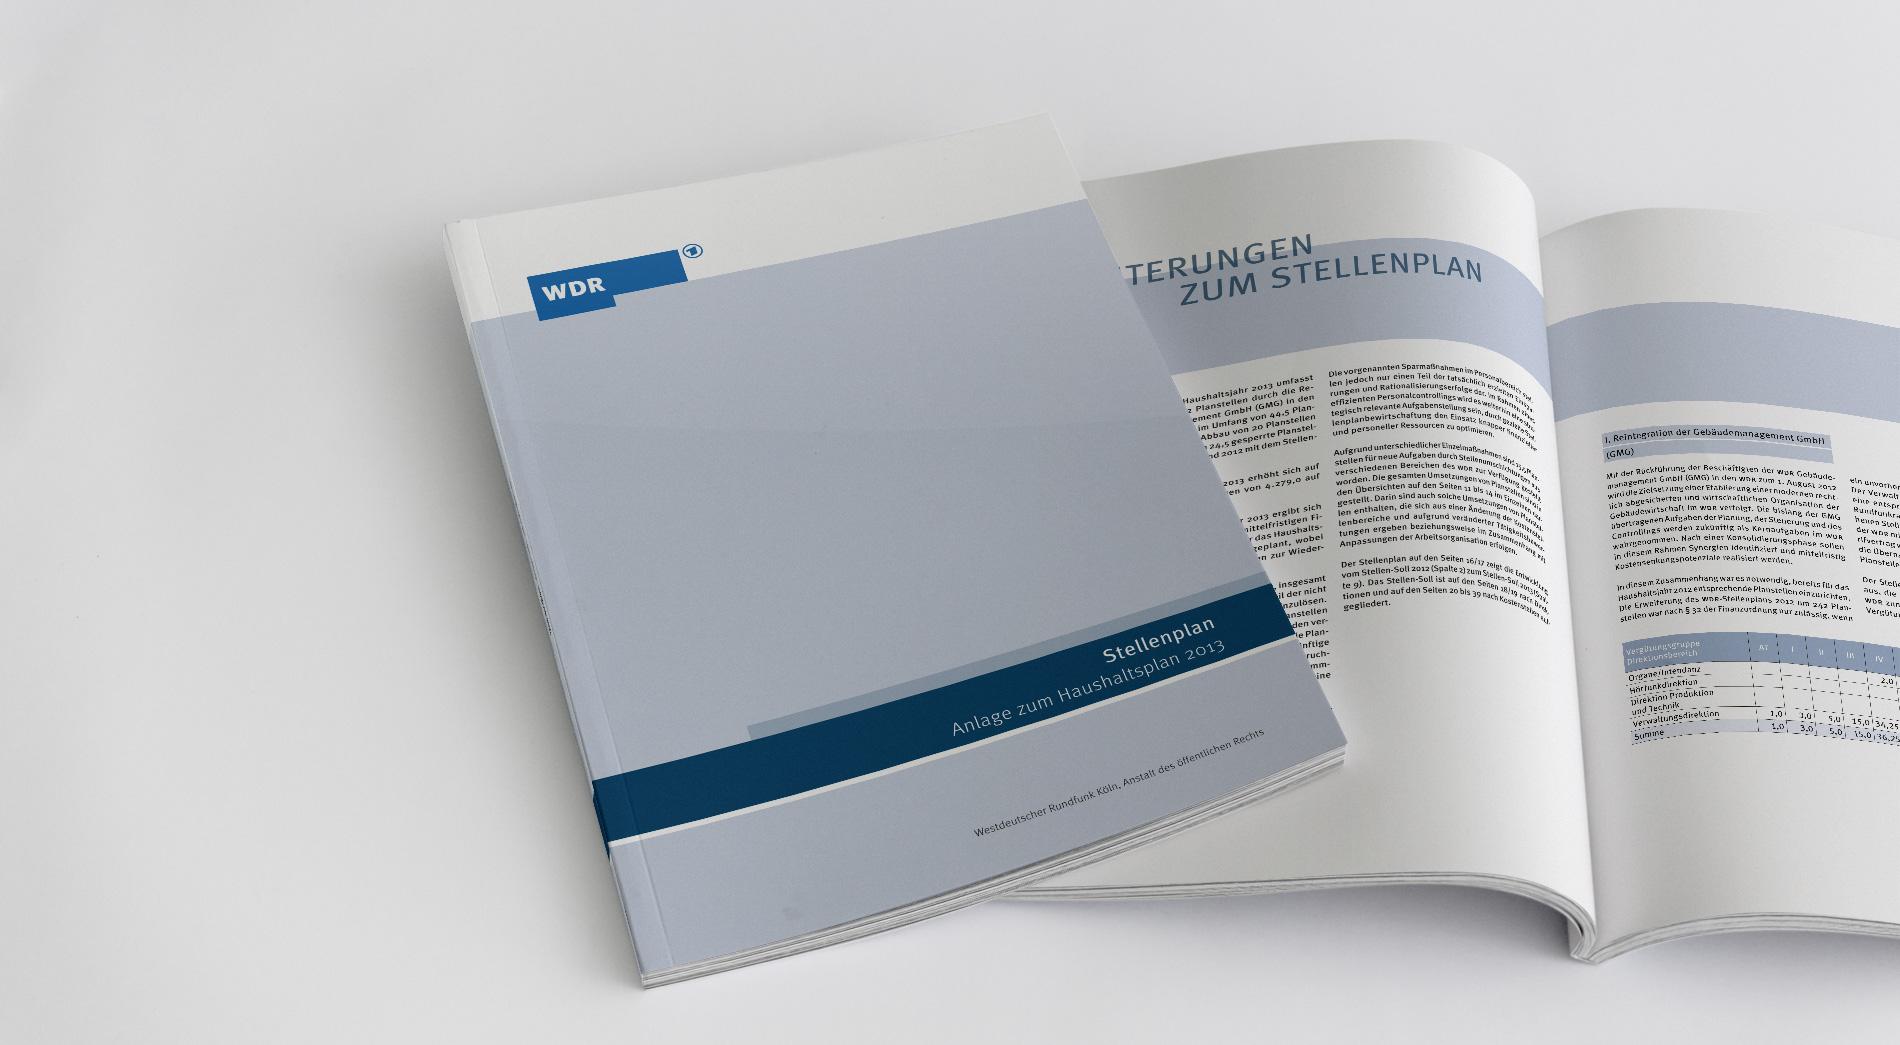 WDR Finanzpublikationen 2012, Stellenplan 2013, Titel